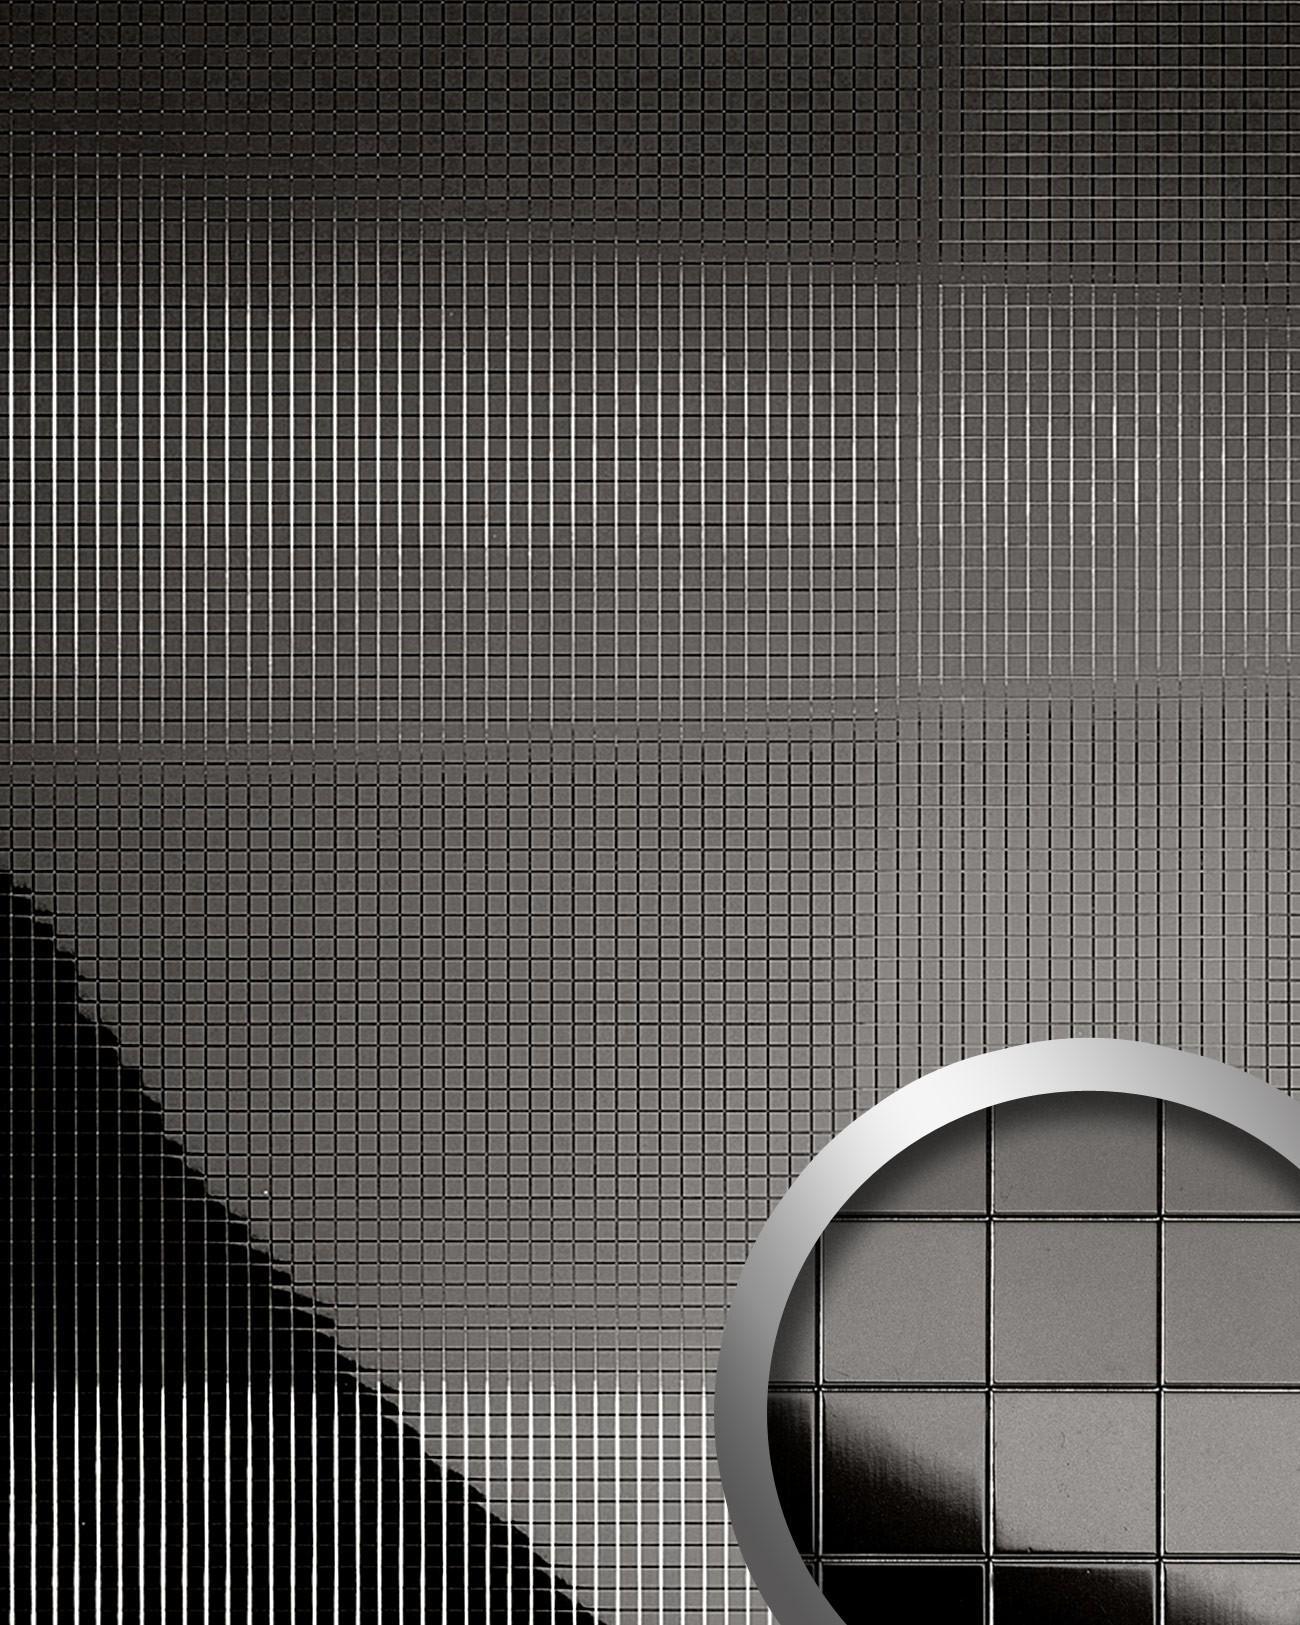 Wandpaneel Wandverkleidung WallFace 10533 M-Style Design Metall ...